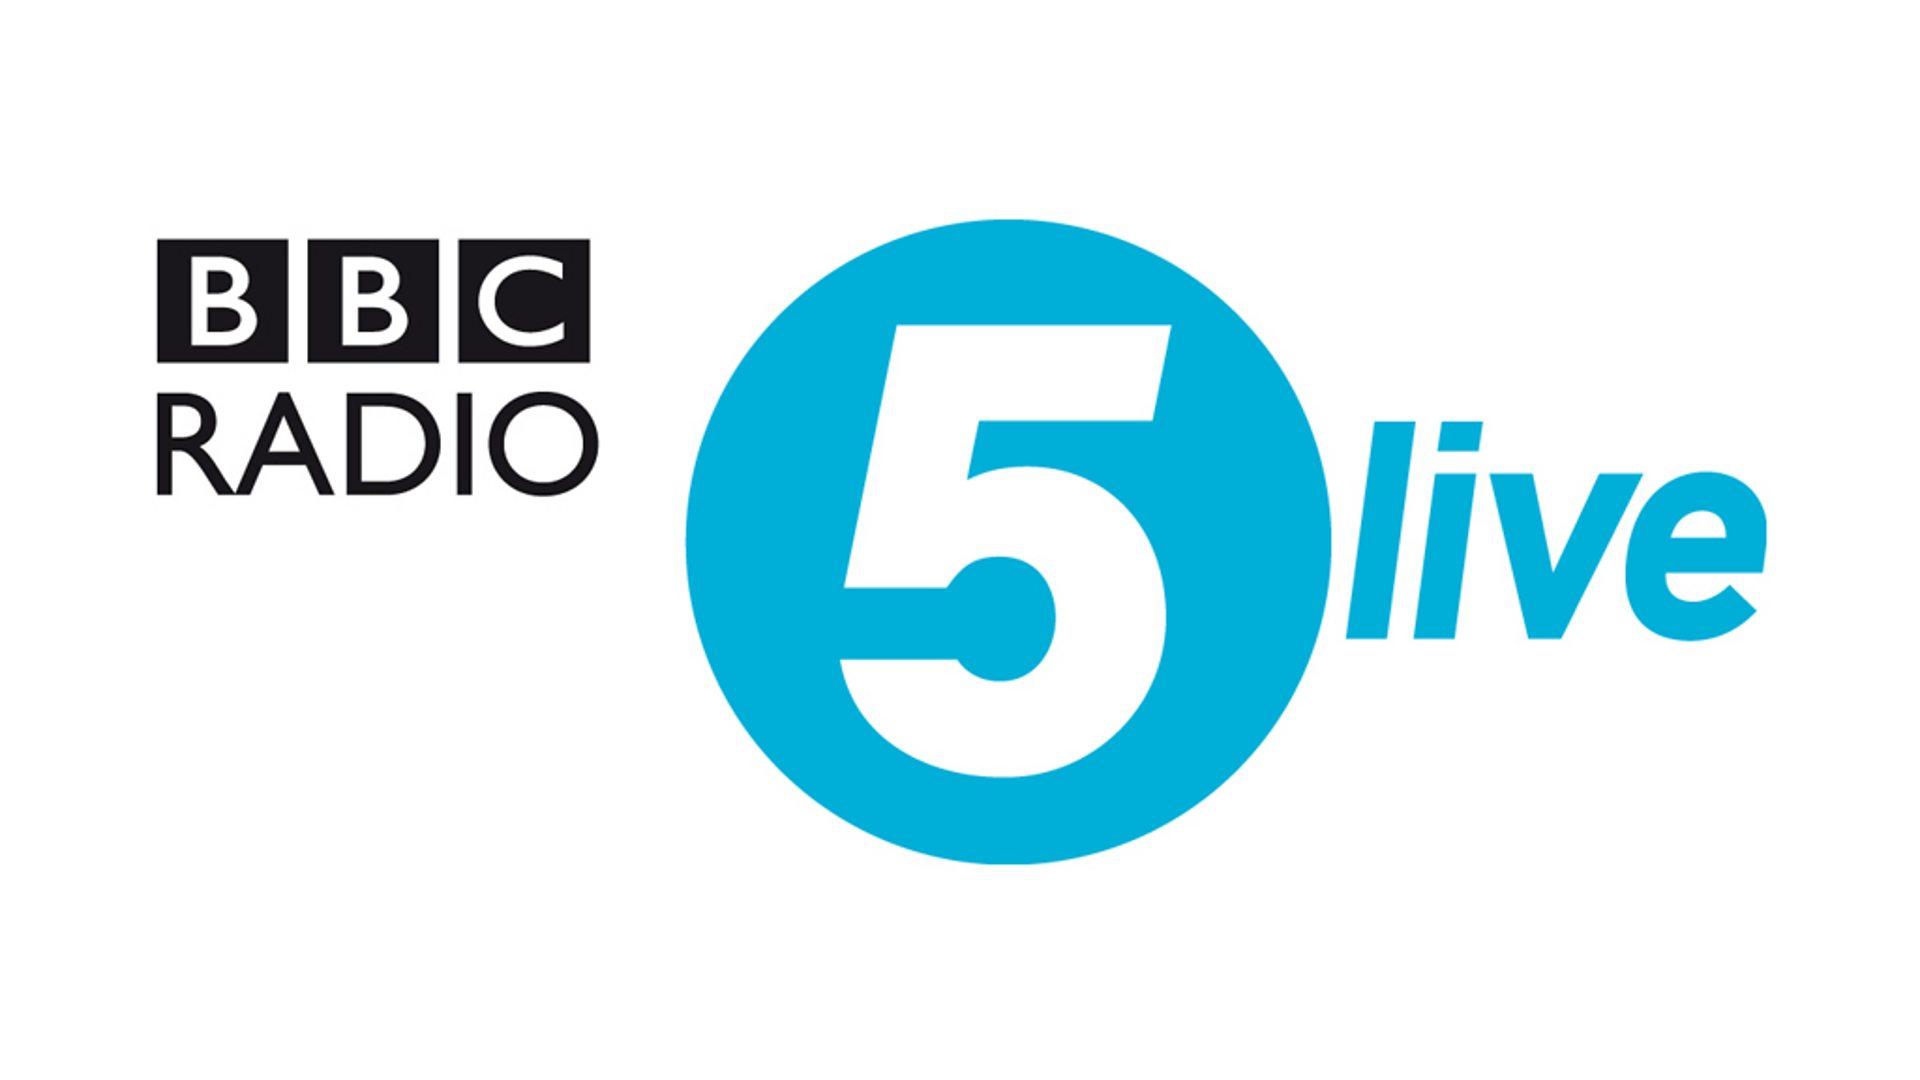 Featured on Radio 5Live